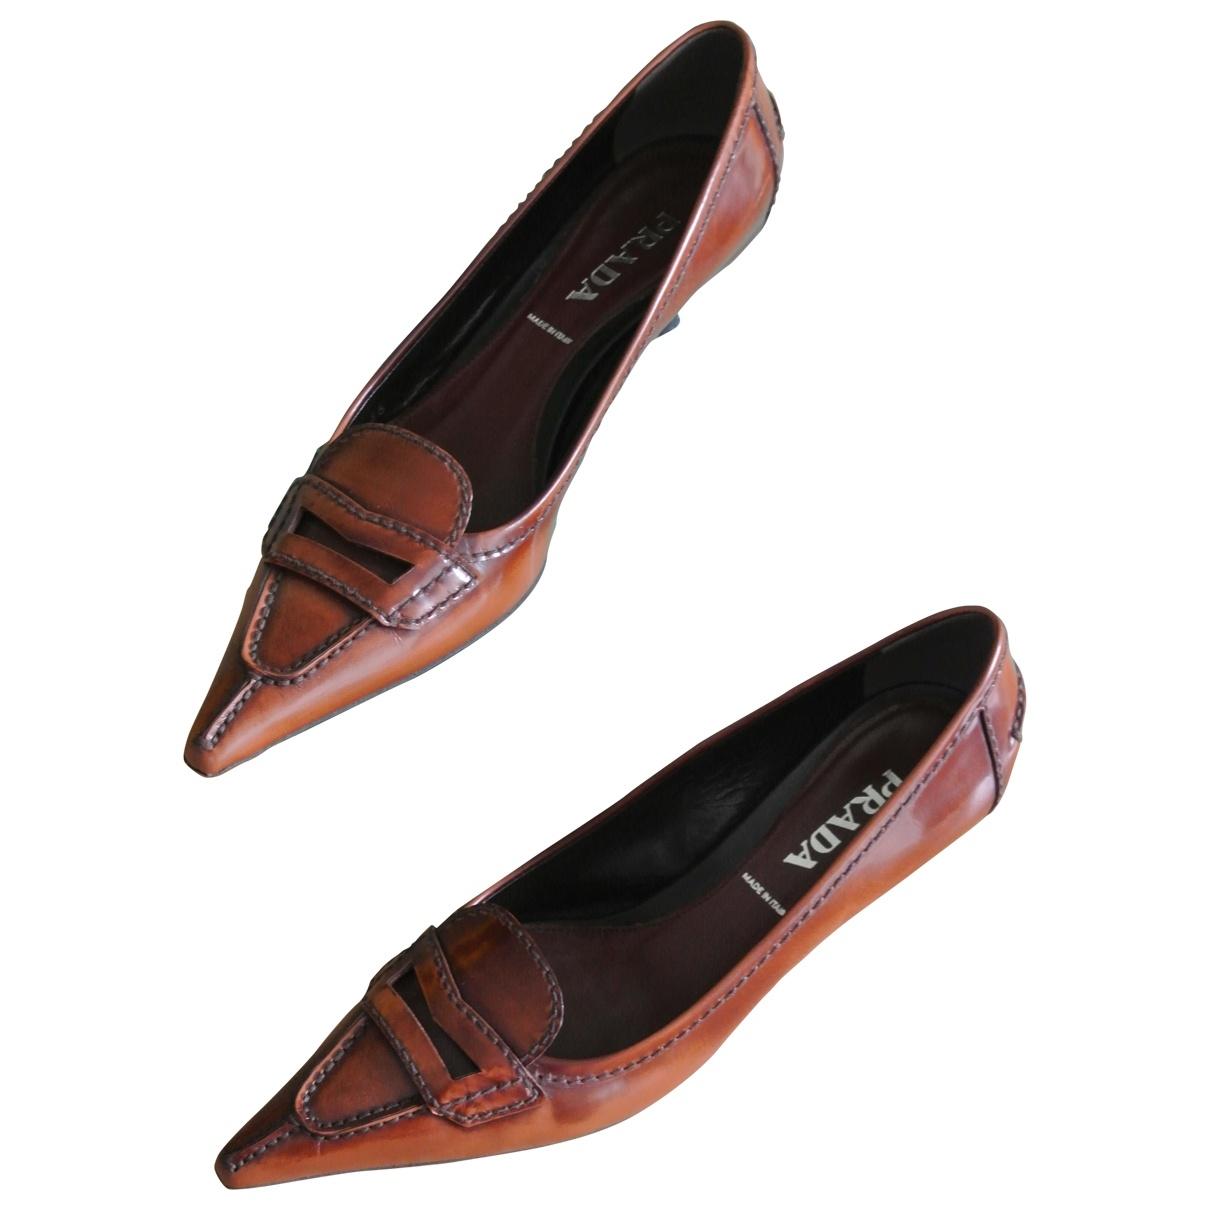 Prada Opanca Brown Patent leather Heels for Women 36 EU